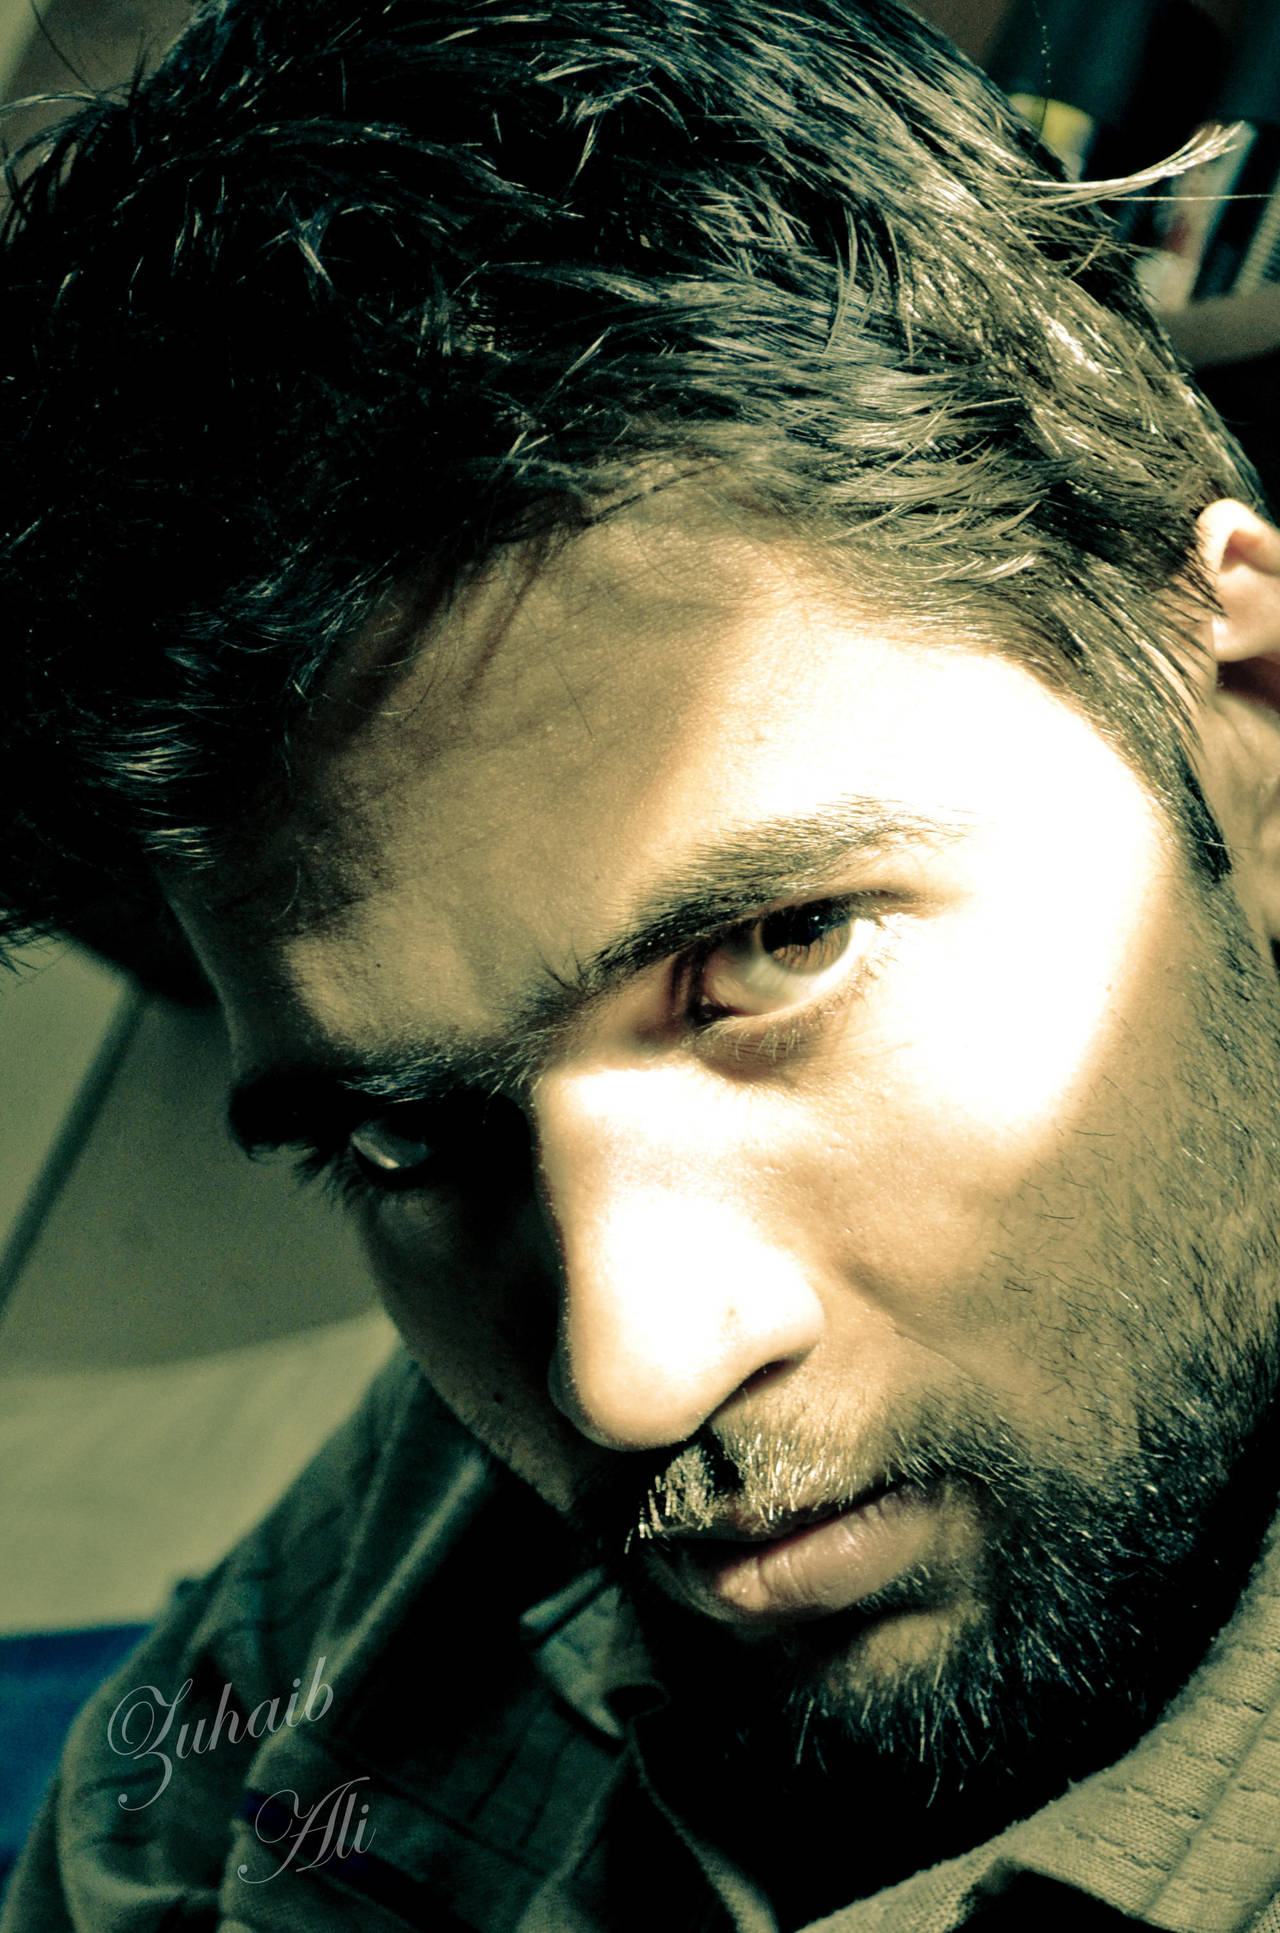 ezuhaib's Profile Picture